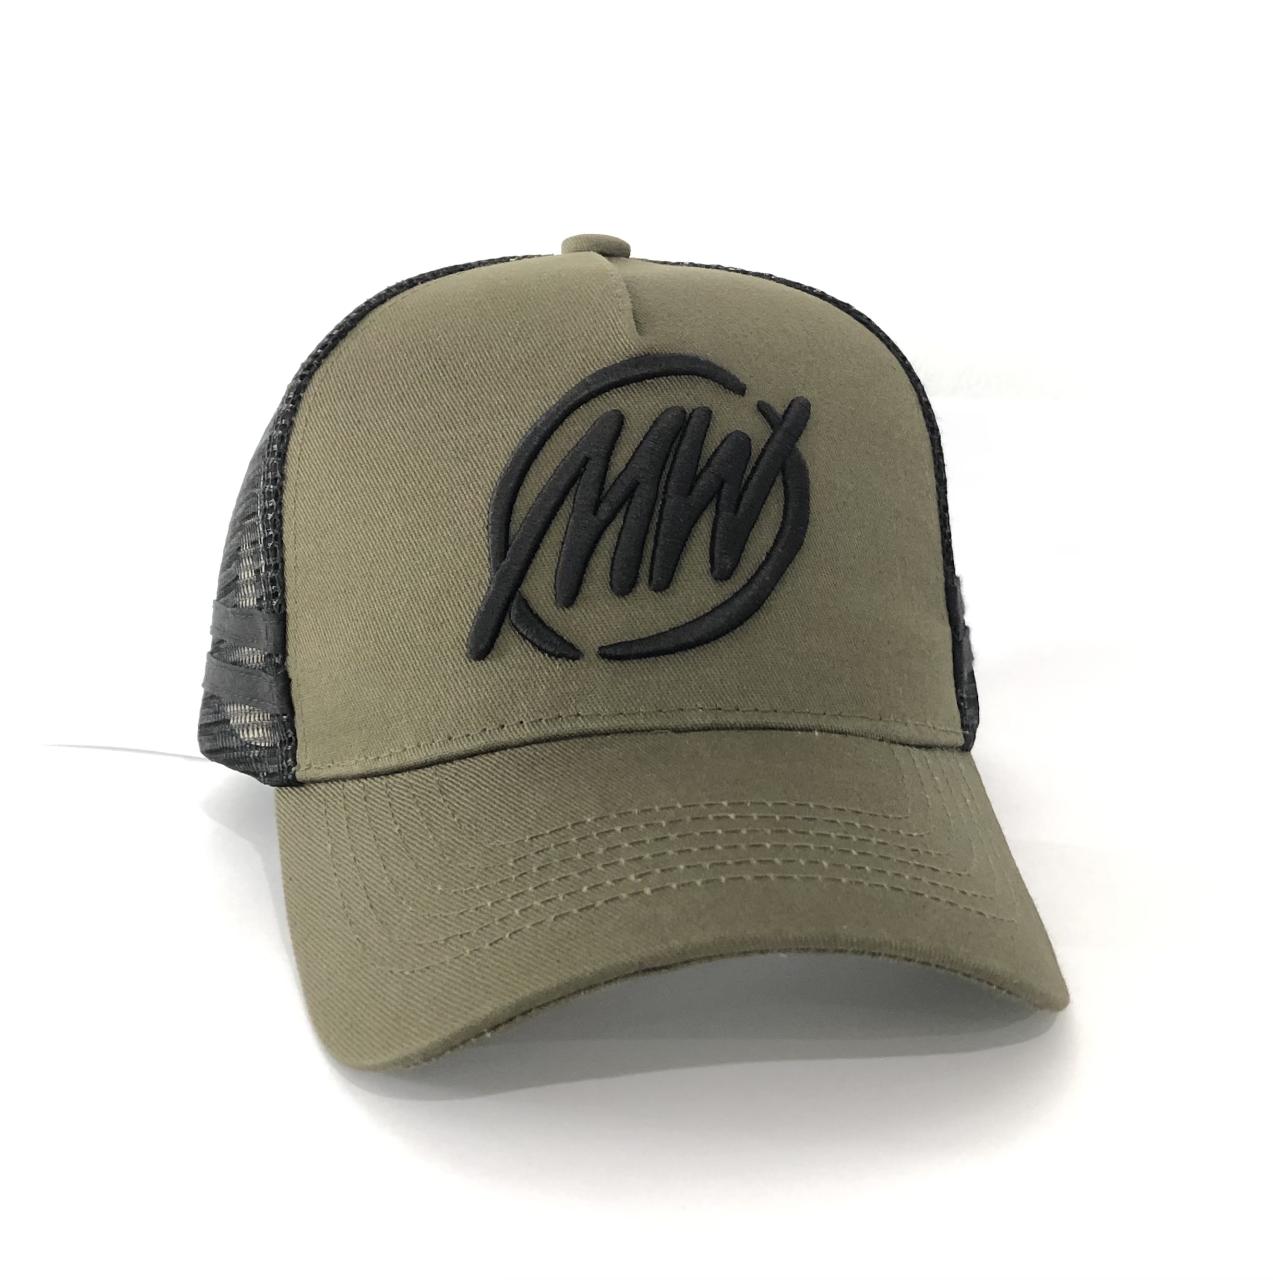 Matt Wright Olive Trucker Cap